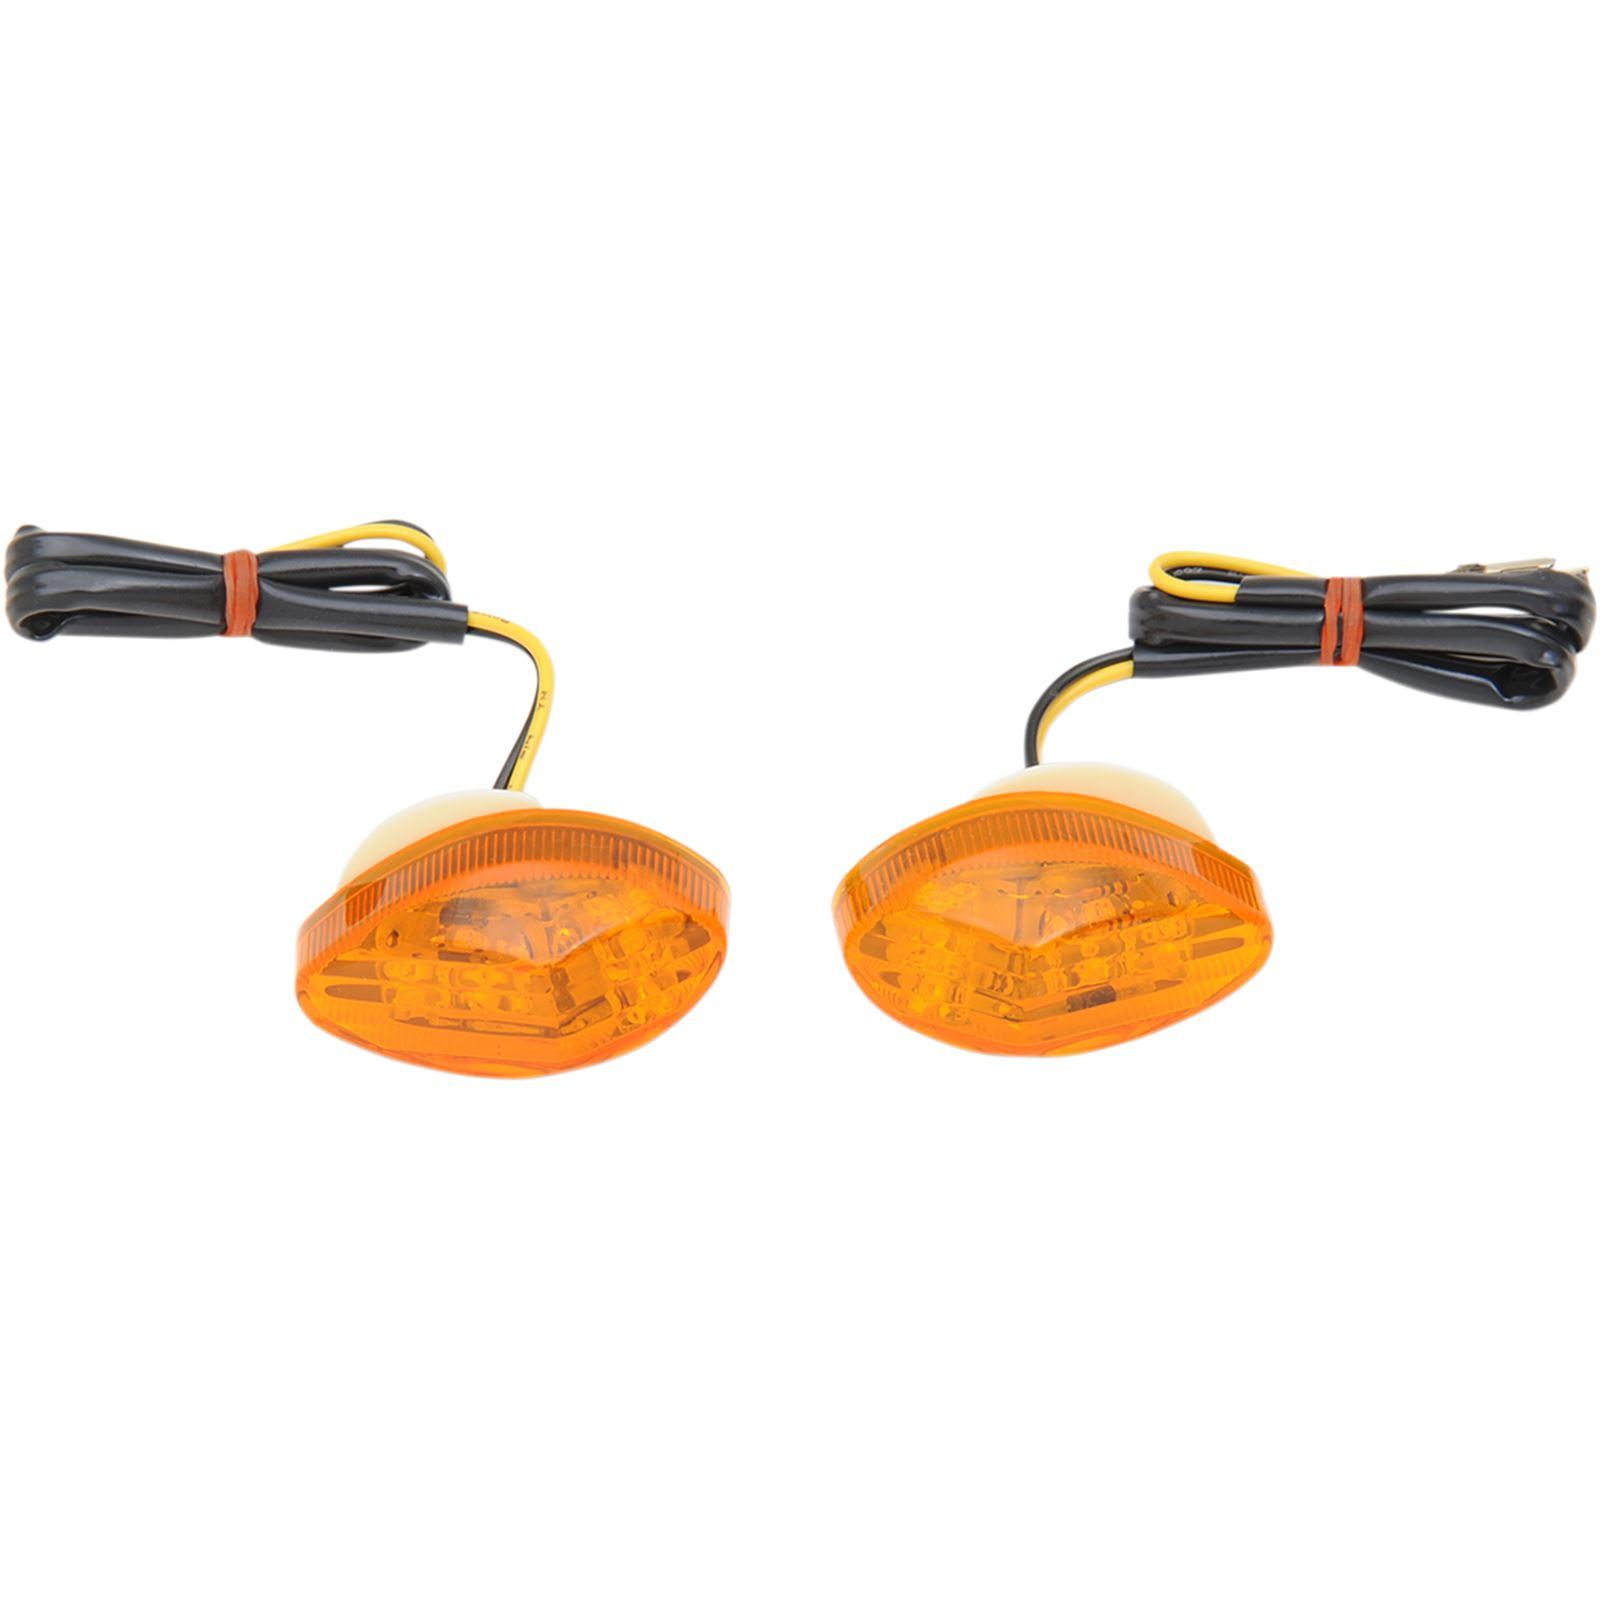 Comp. Werkes LED Marker Lights - Honda - Amber